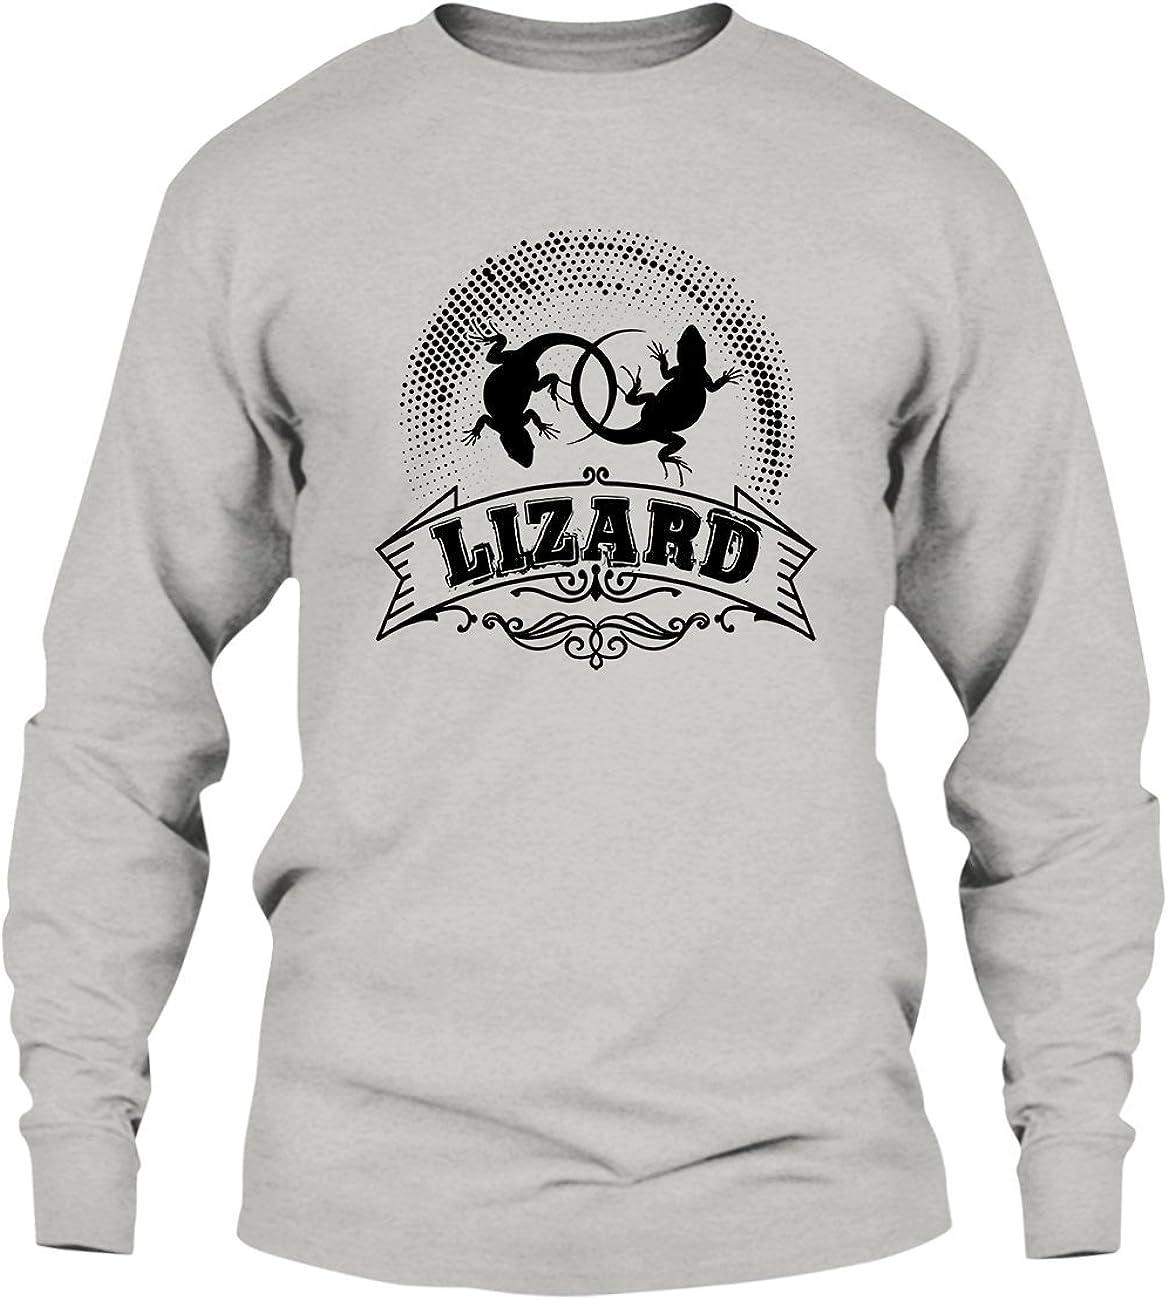 Shirt Vintage Style Lizard Tee Shirt Hoodies